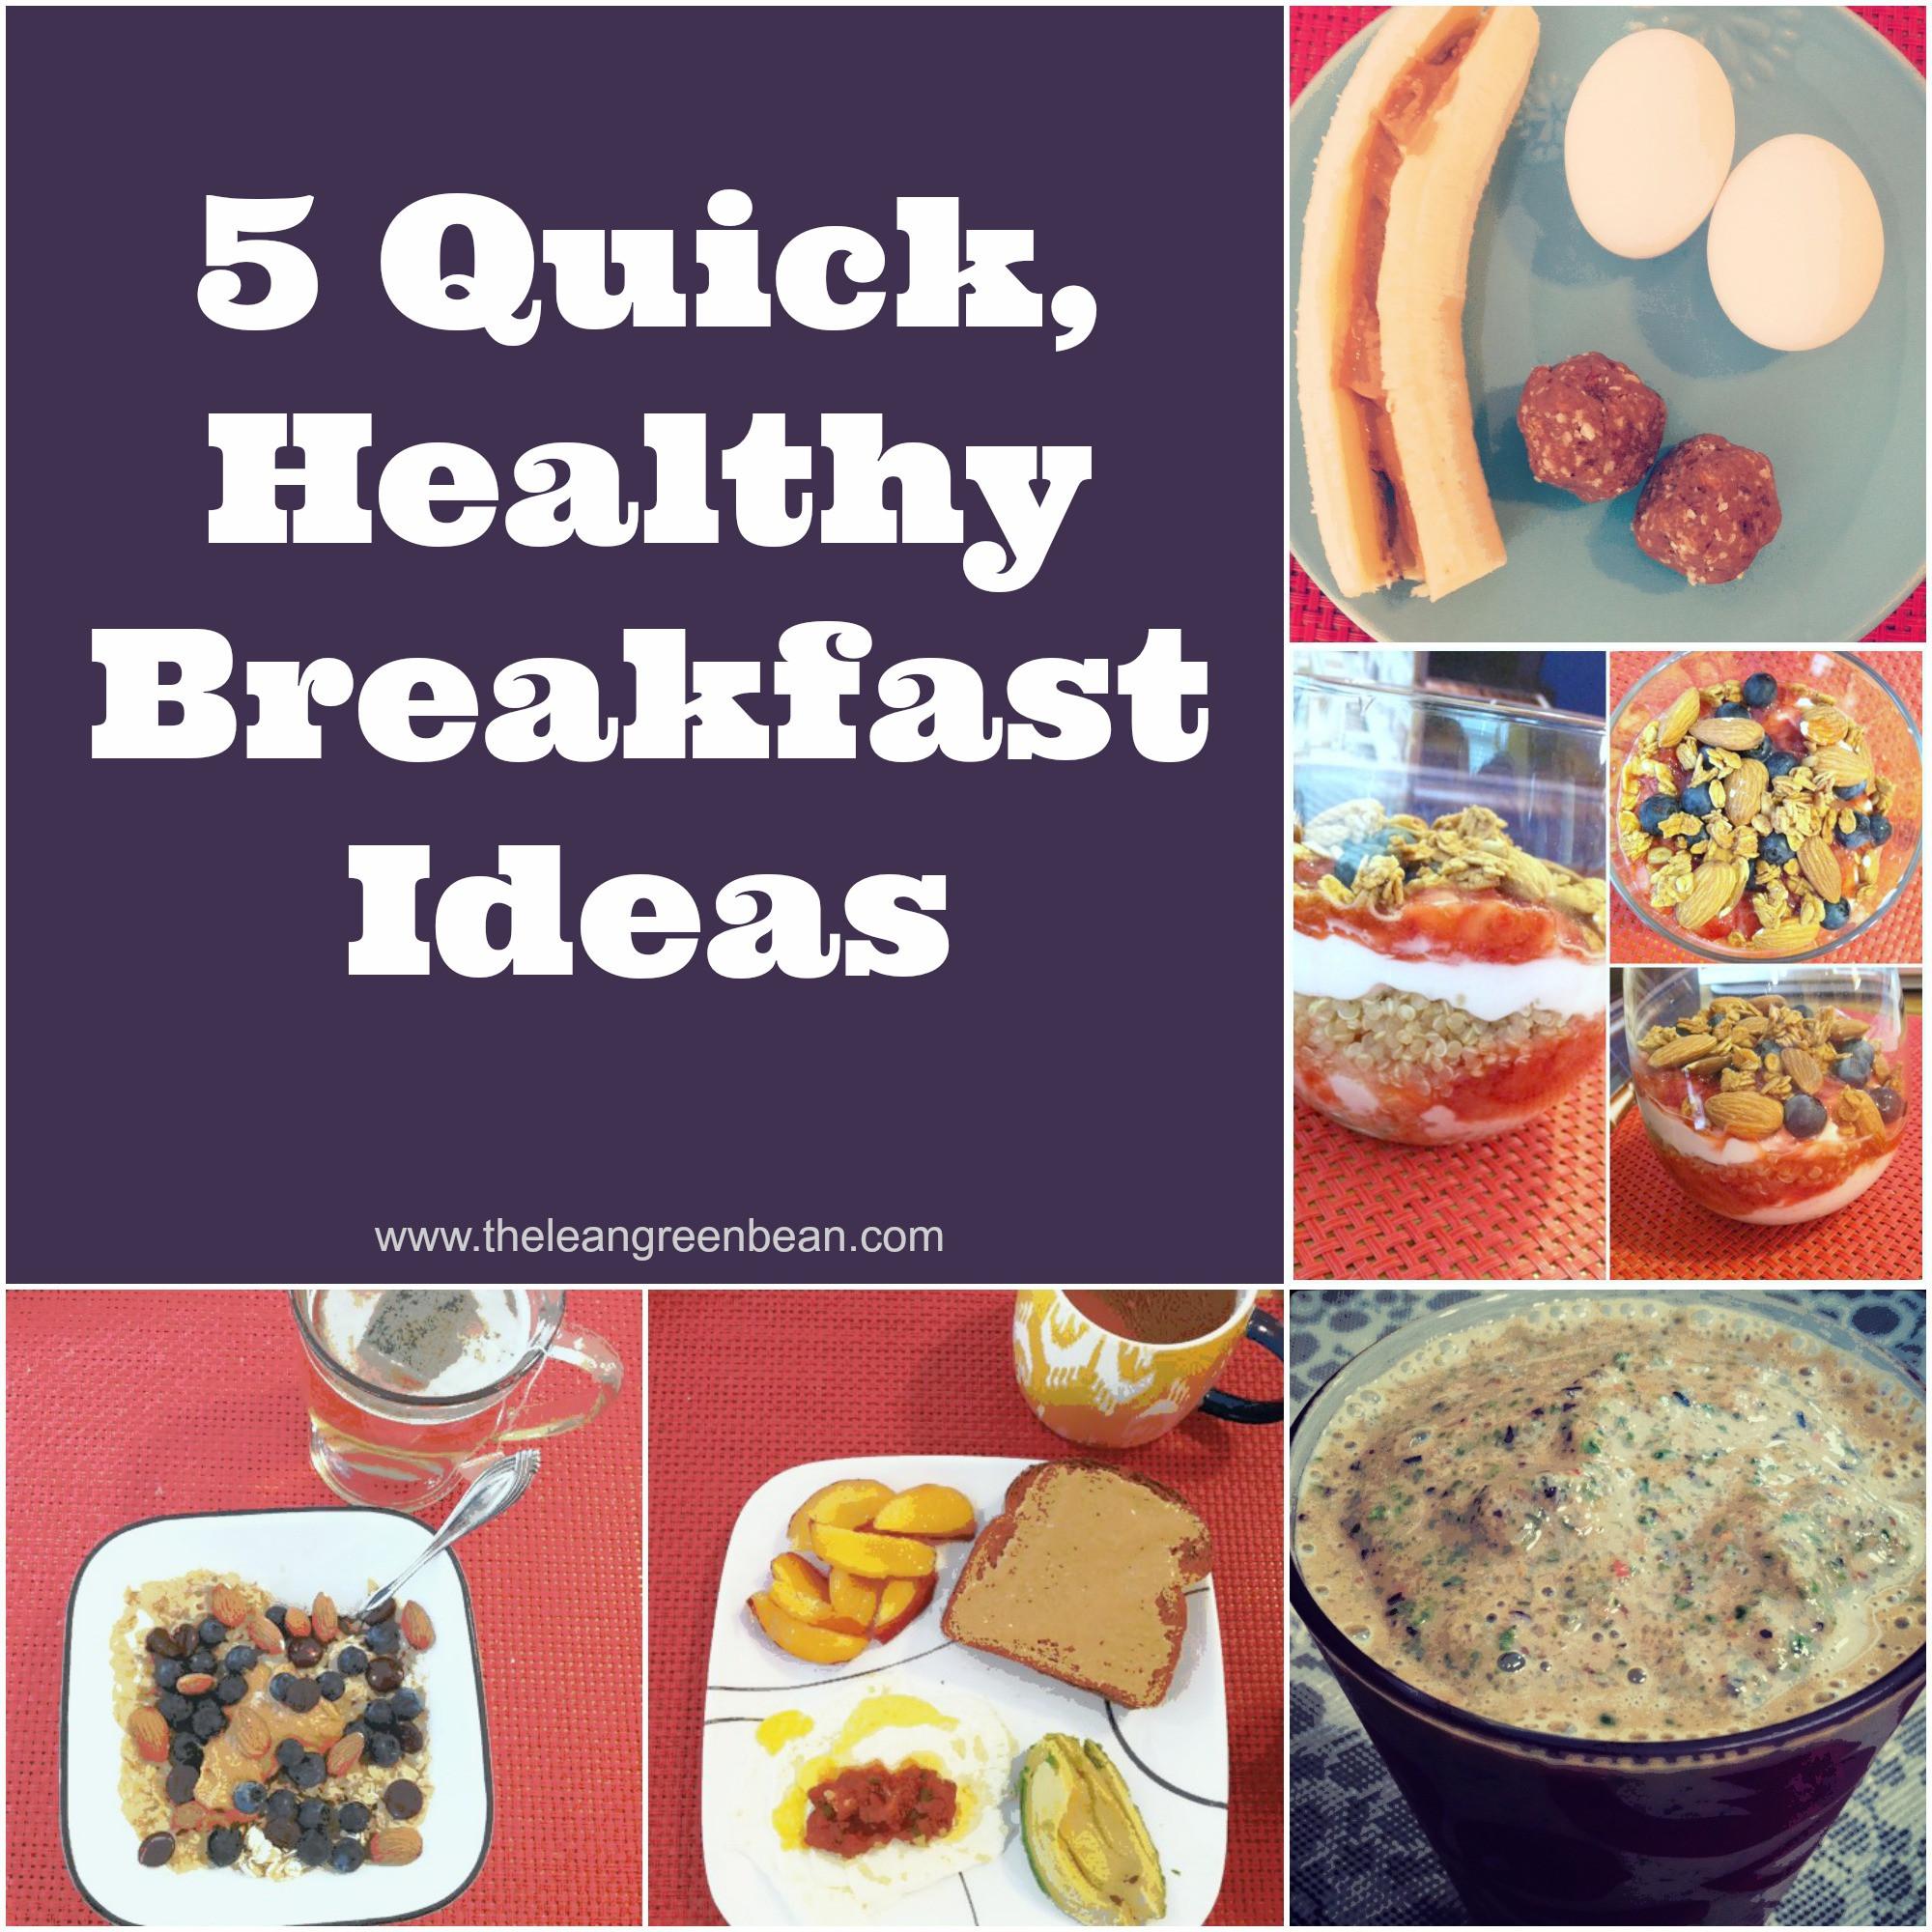 Fast Healthy Breakfast  5 Quick Healthy Breakfast Ideas from a Registered Dietitian